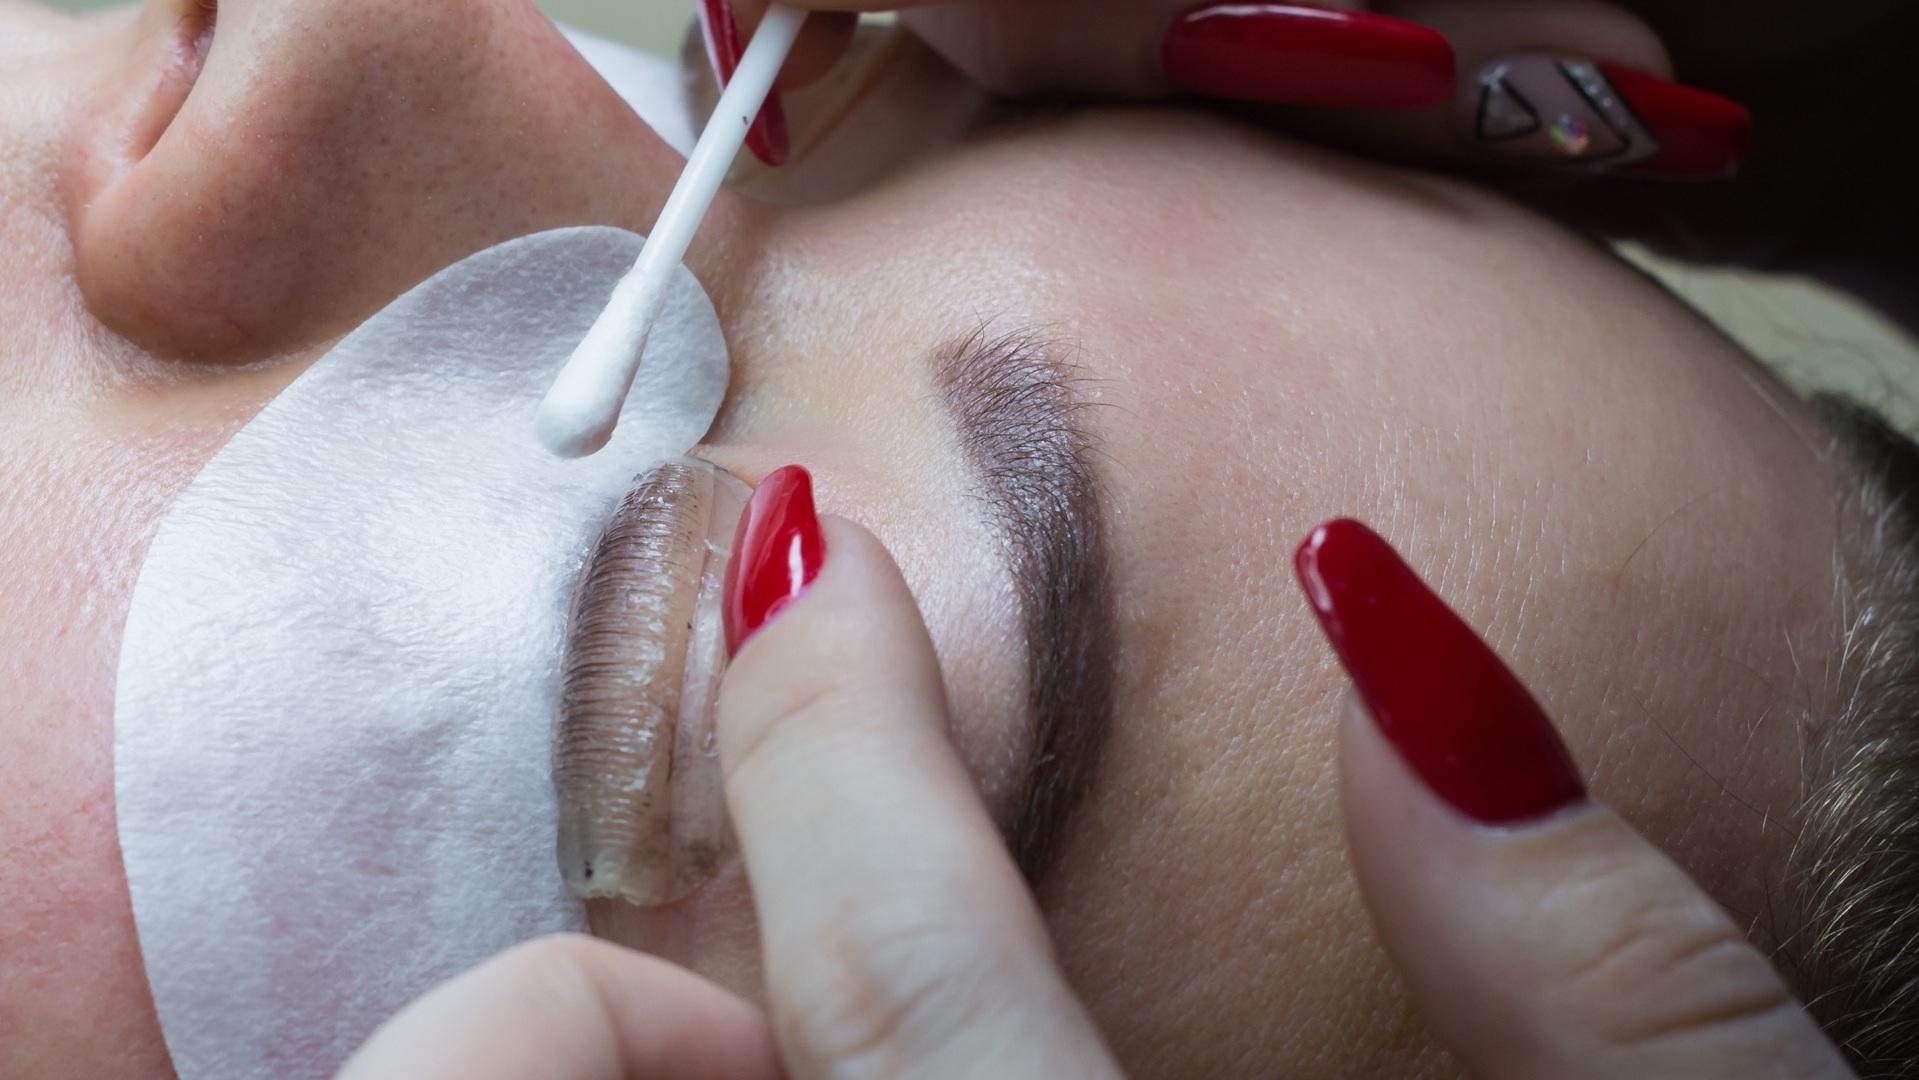 Eyelash Lifts and Tint - Eyelash lifts enhance the shape of your eyelashes' natural curl, giving an effortless result similar to that of a professional, mechanical eyelash curler. Eyelash tint services deepen the colour of natural eyelashes, providing mascara-free definition.